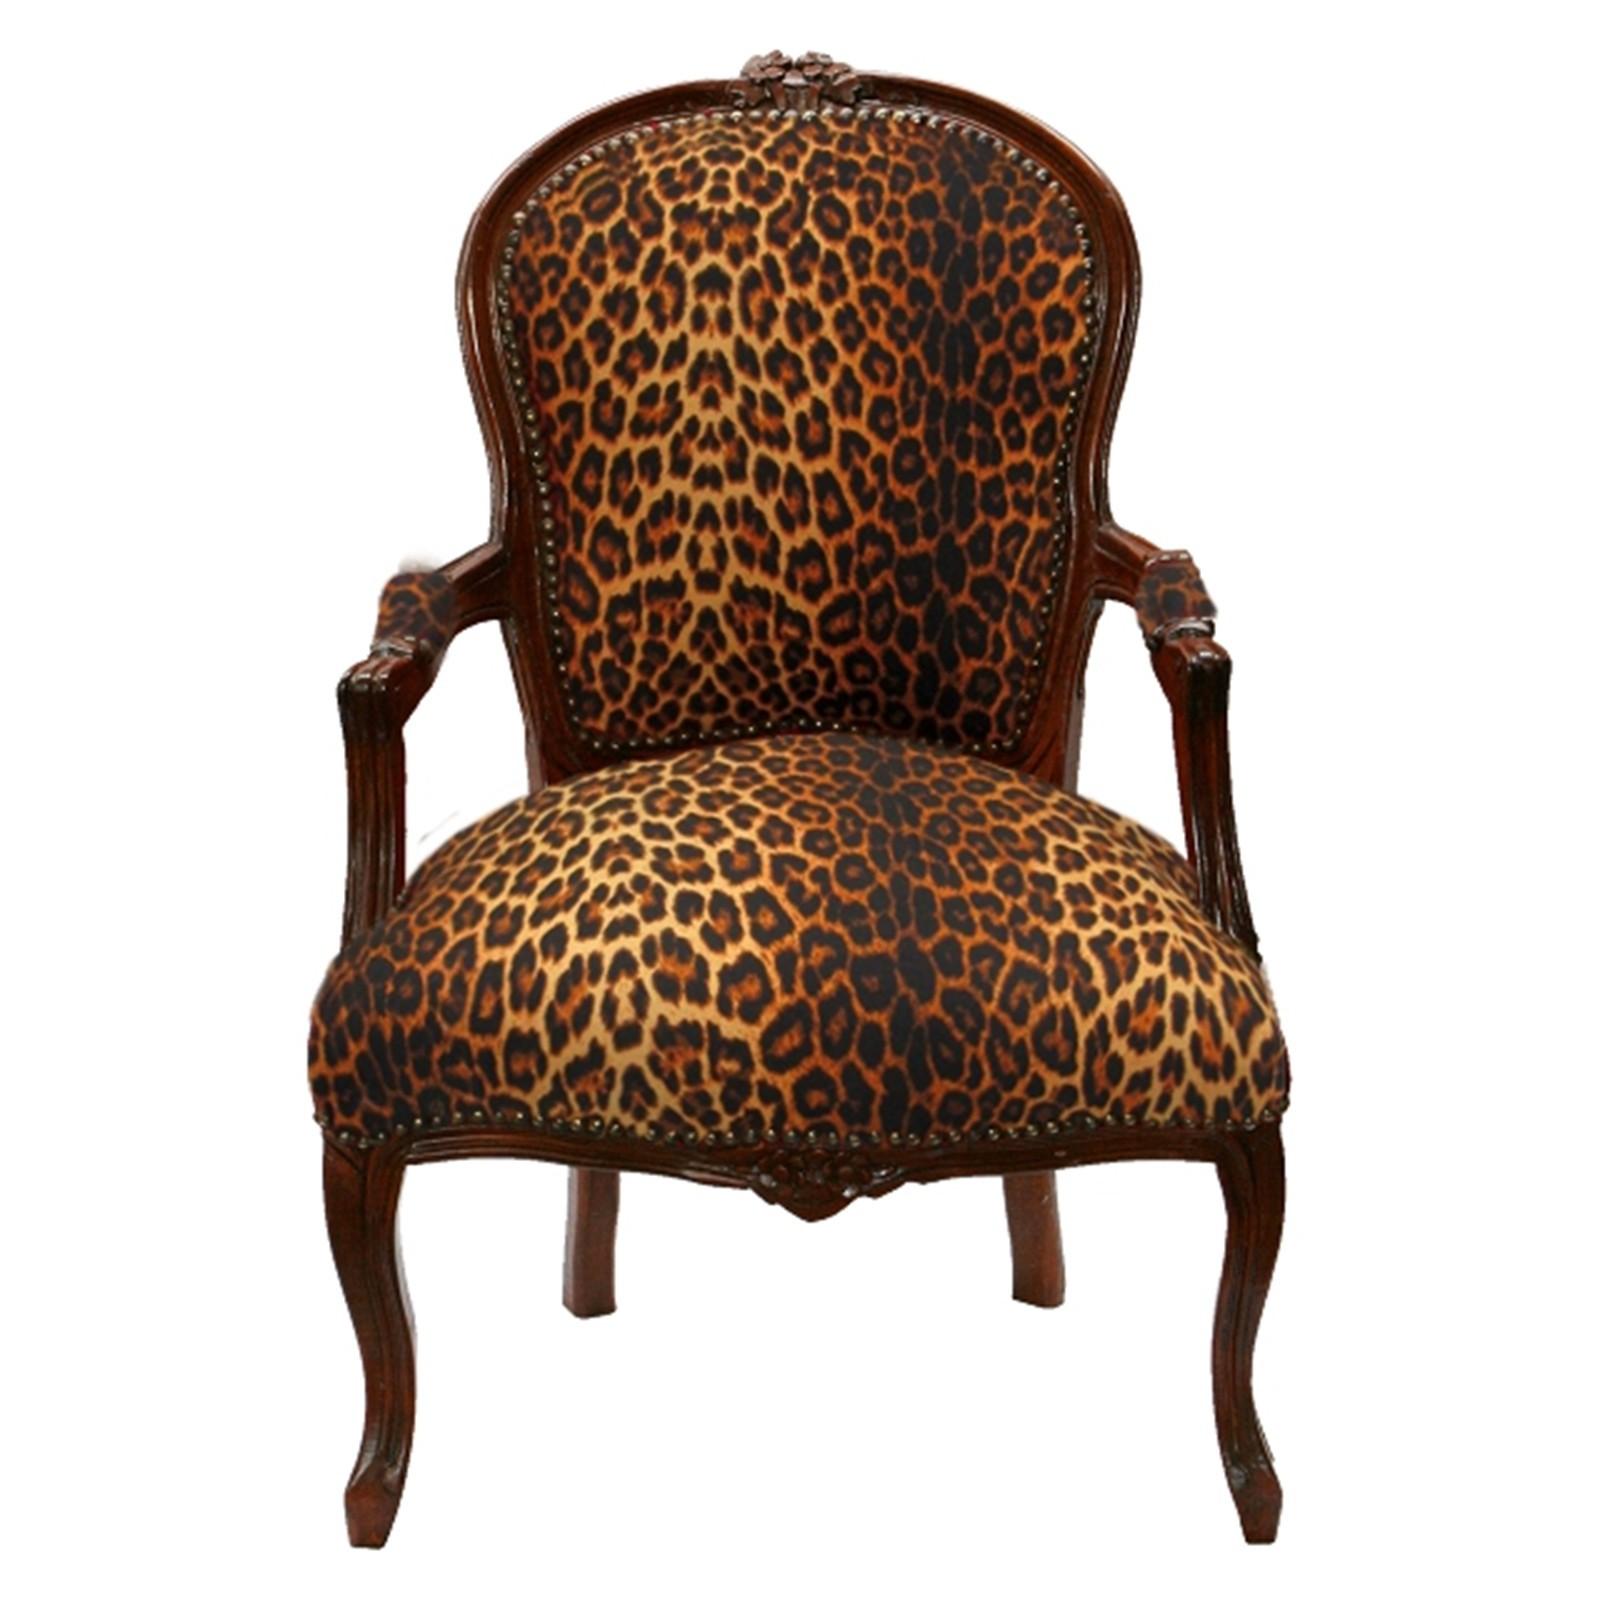 leoparden brauner antiker barock stuhl salon stuhl safari look gepolstert. Black Bedroom Furniture Sets. Home Design Ideas